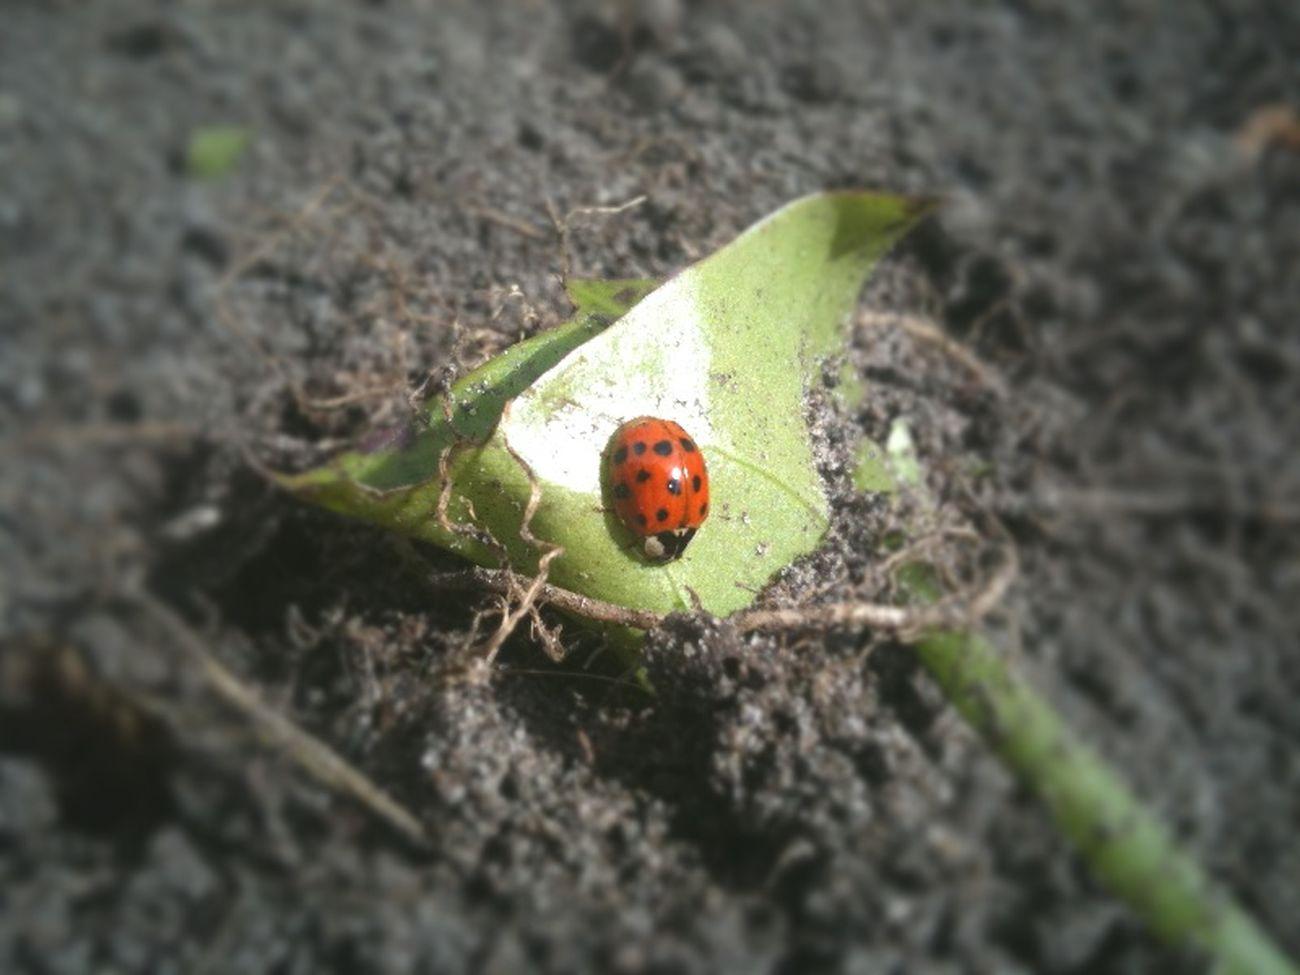 #iphoneography #malditoiphone #bugs natura